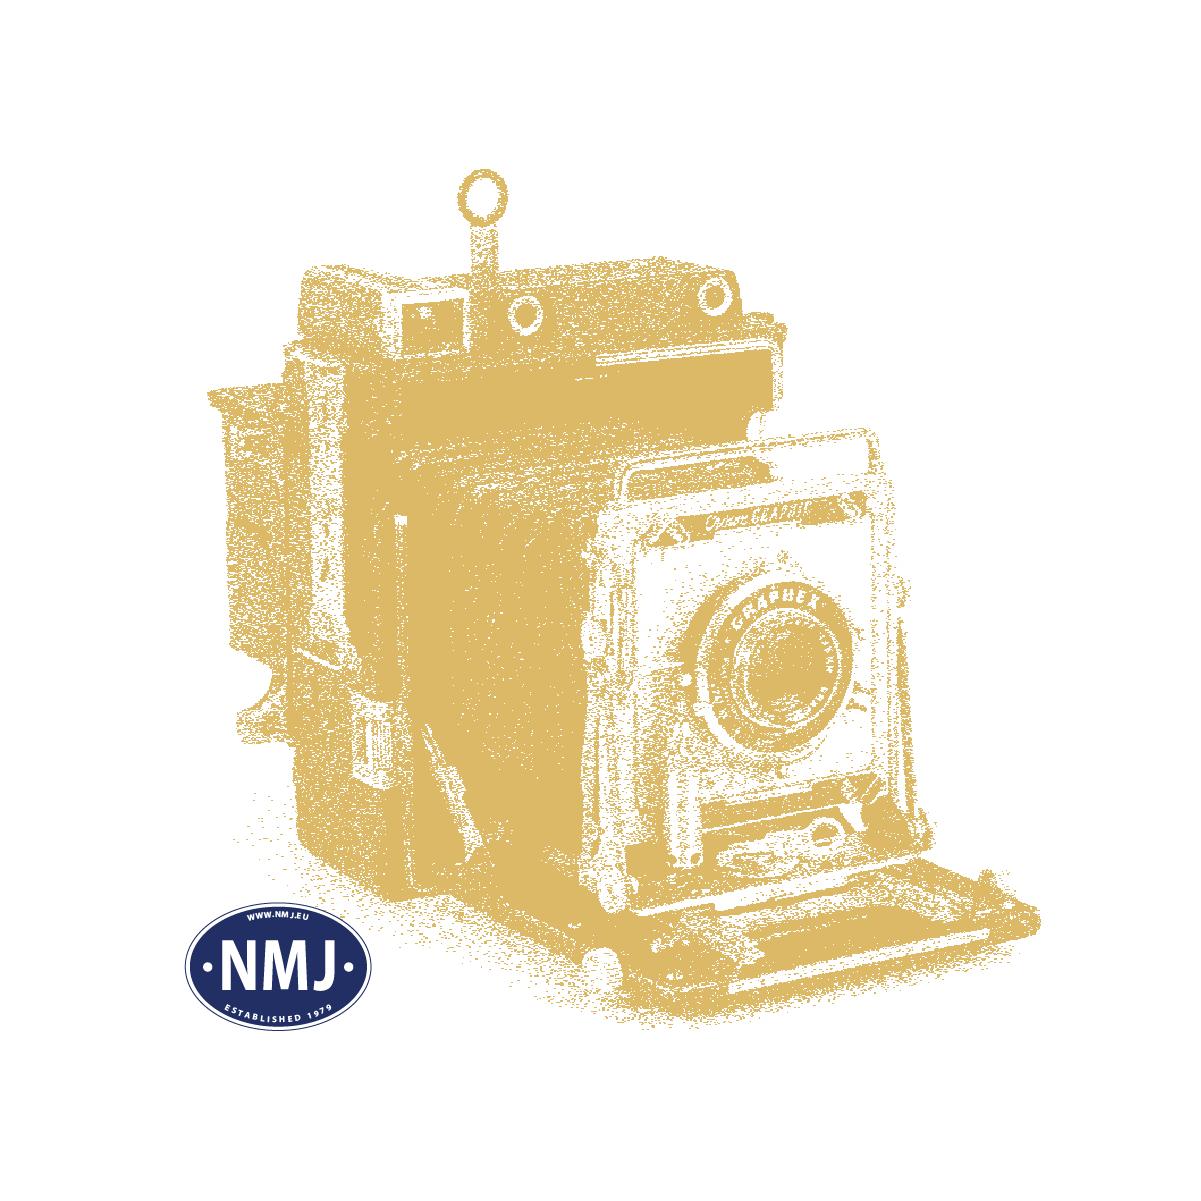 NMJT135.201 - NMJ Topline AB11.24104 mellomdesign